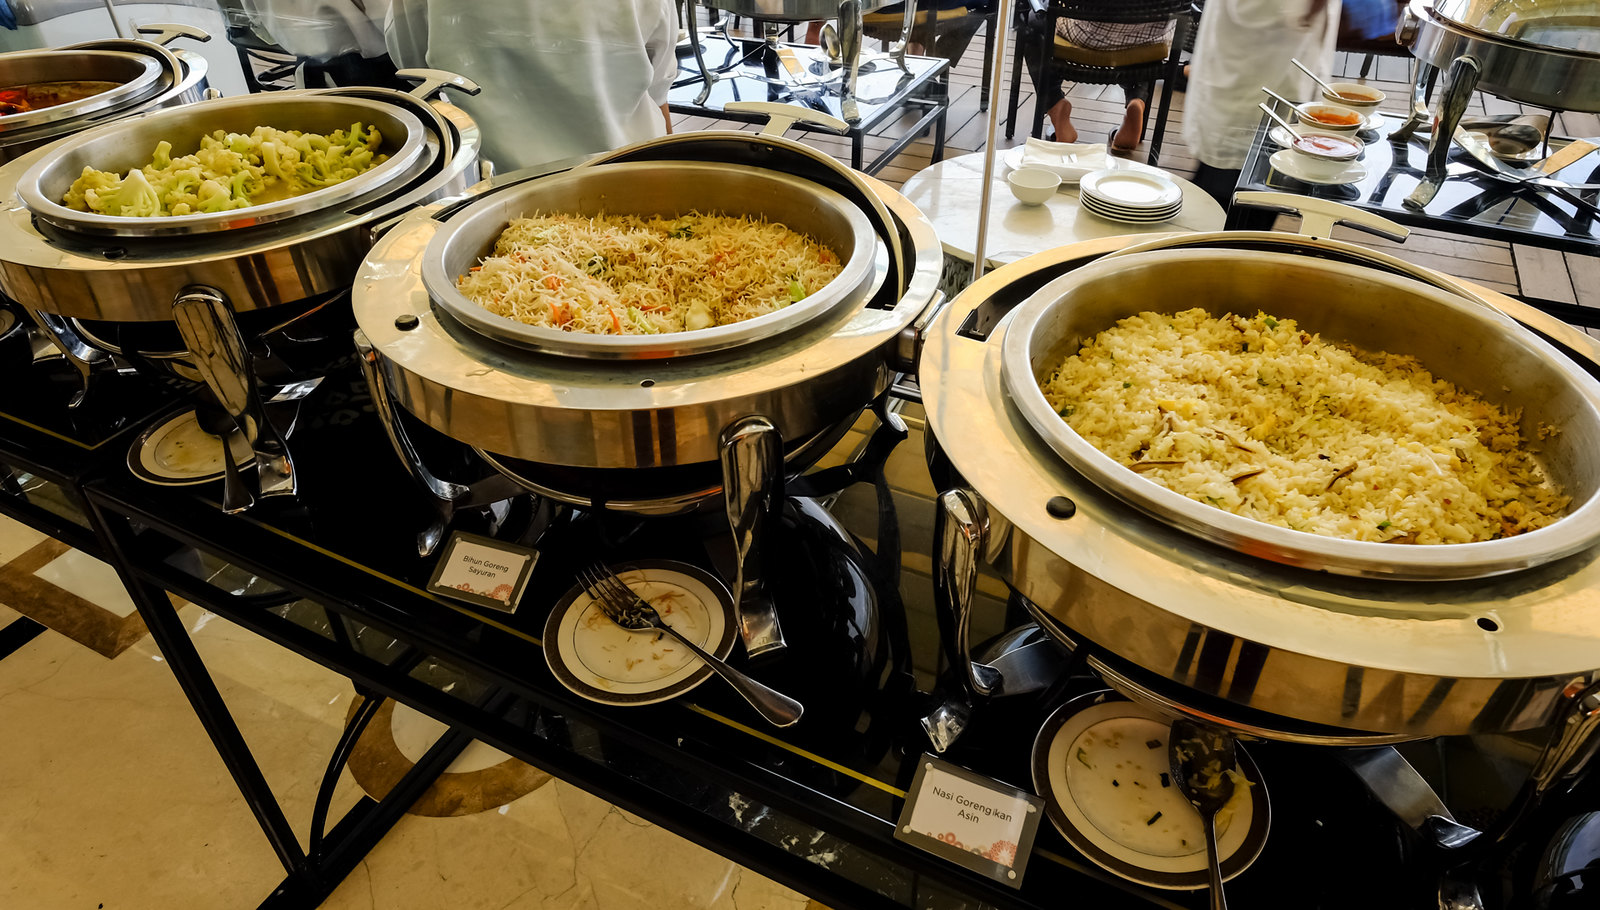 Fried rice and mee hoon